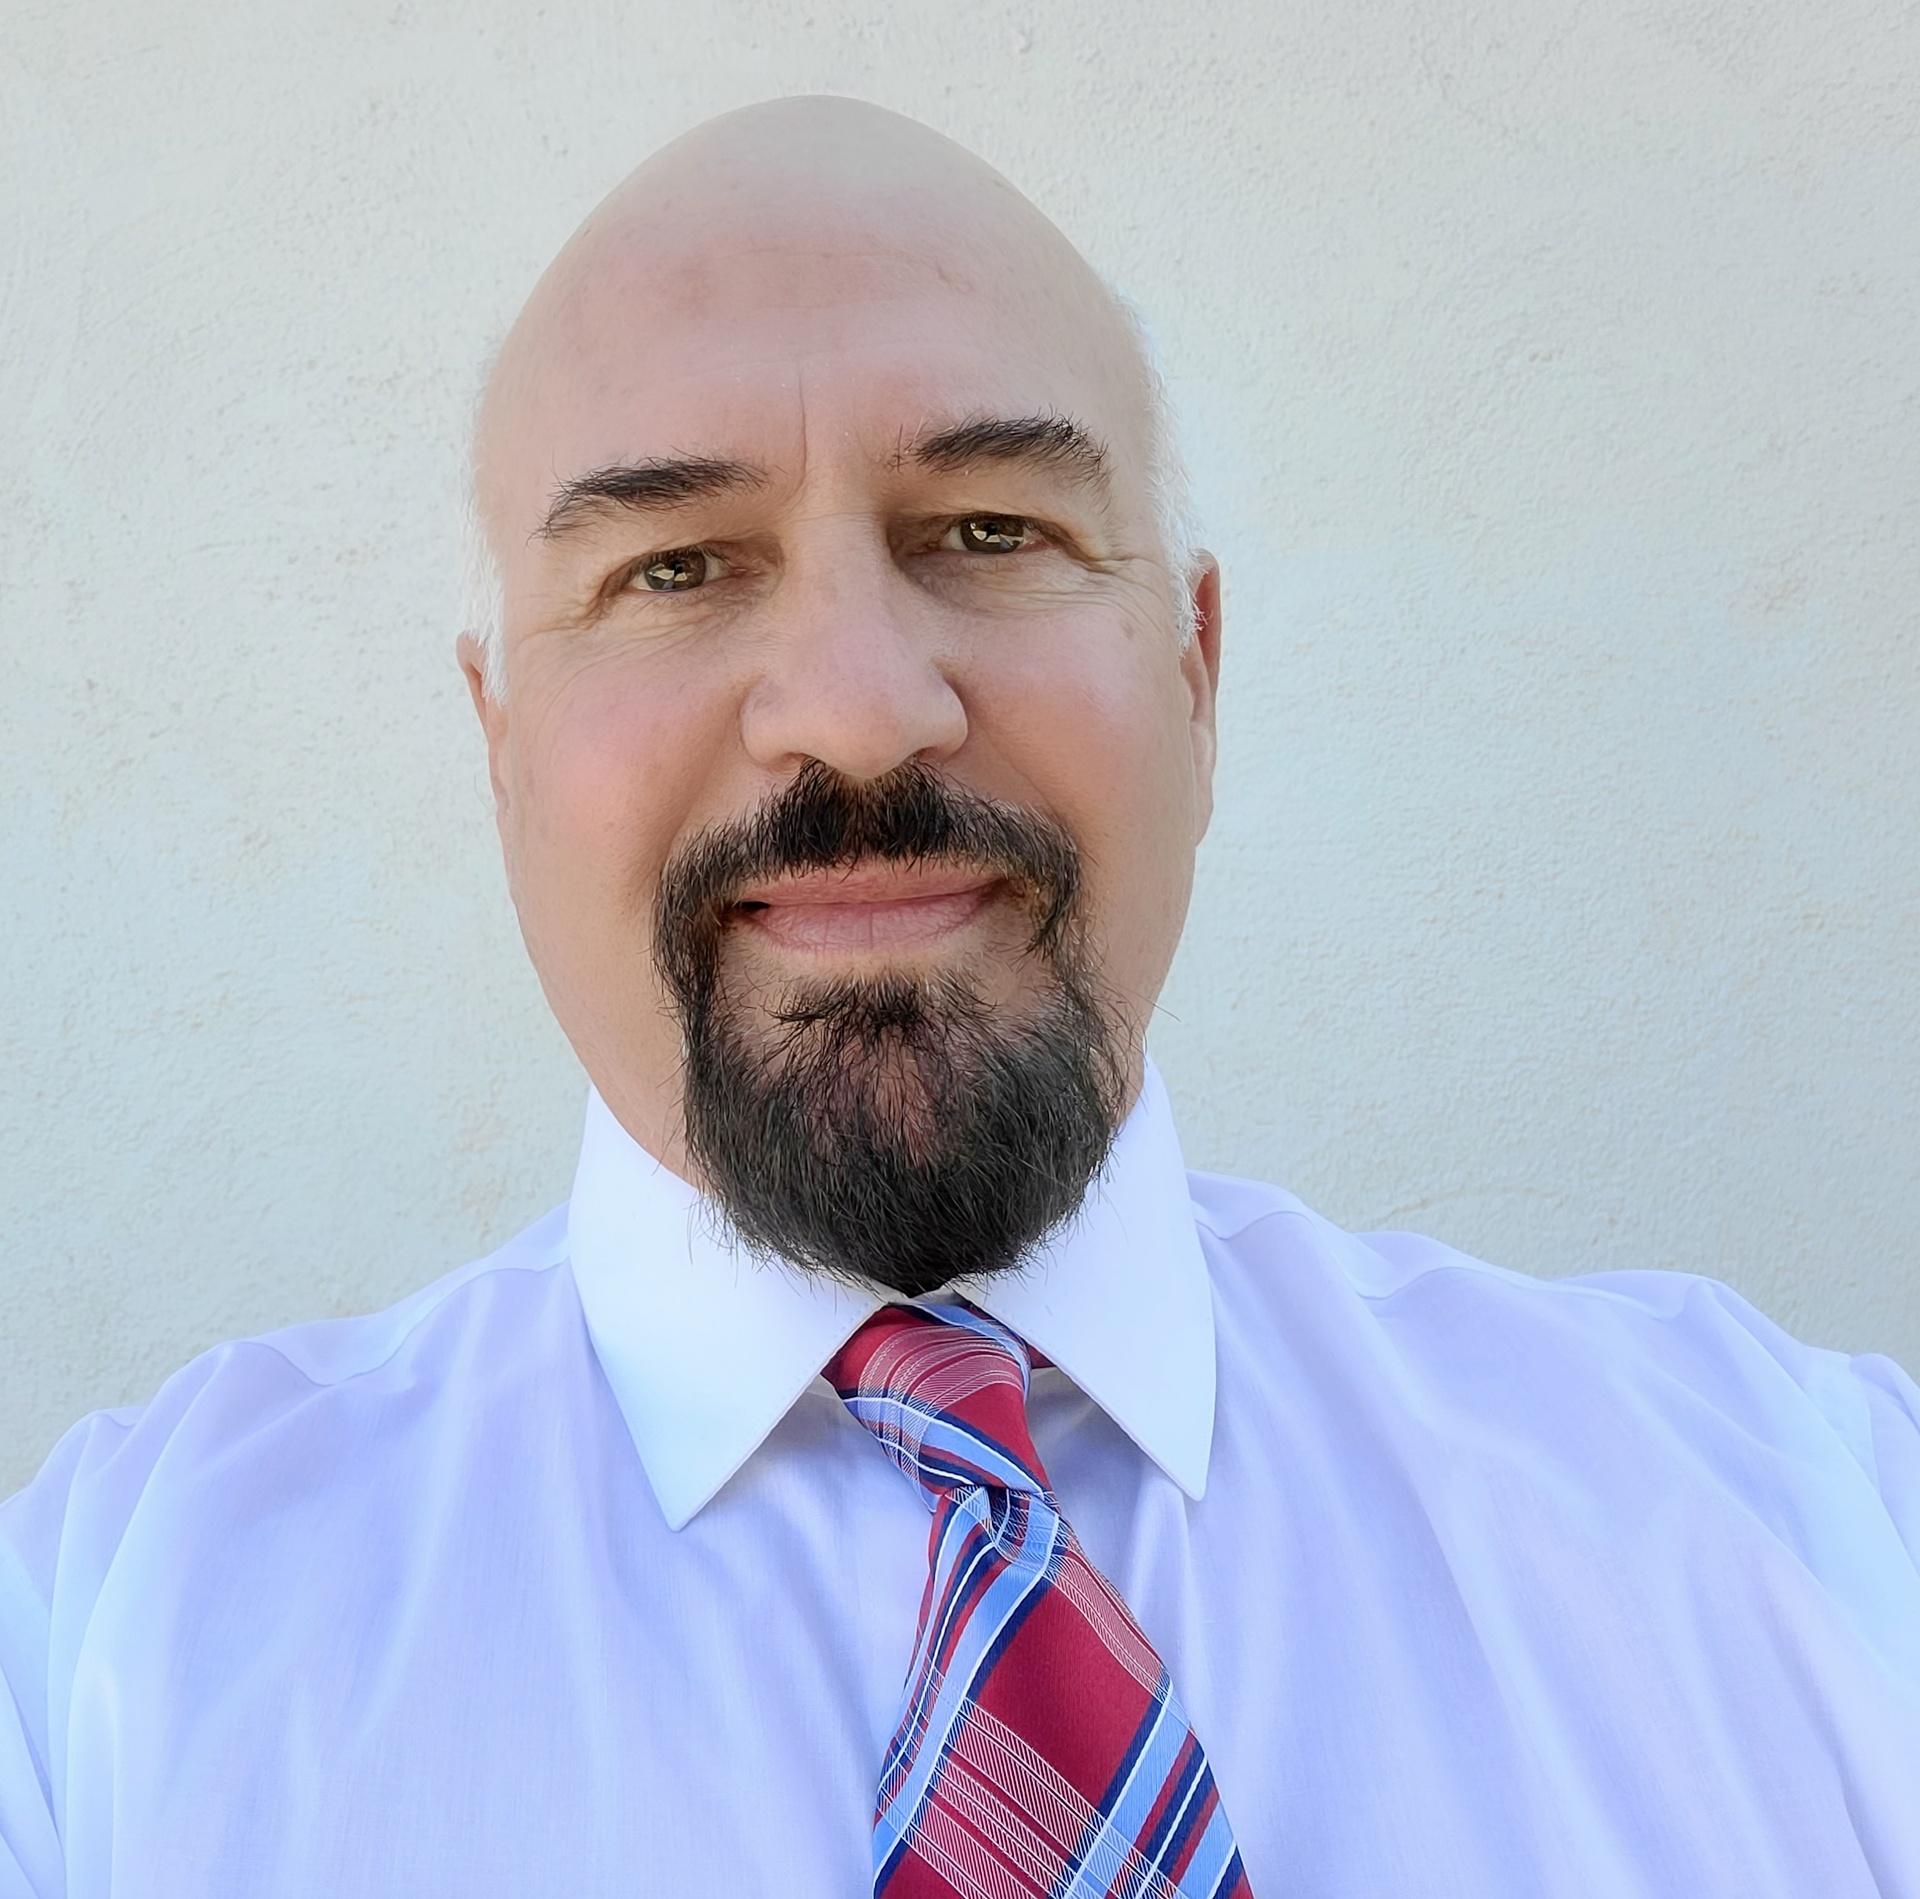 Michael Kimmel   Health and Life Insurance Agent   Marina, CA 93933